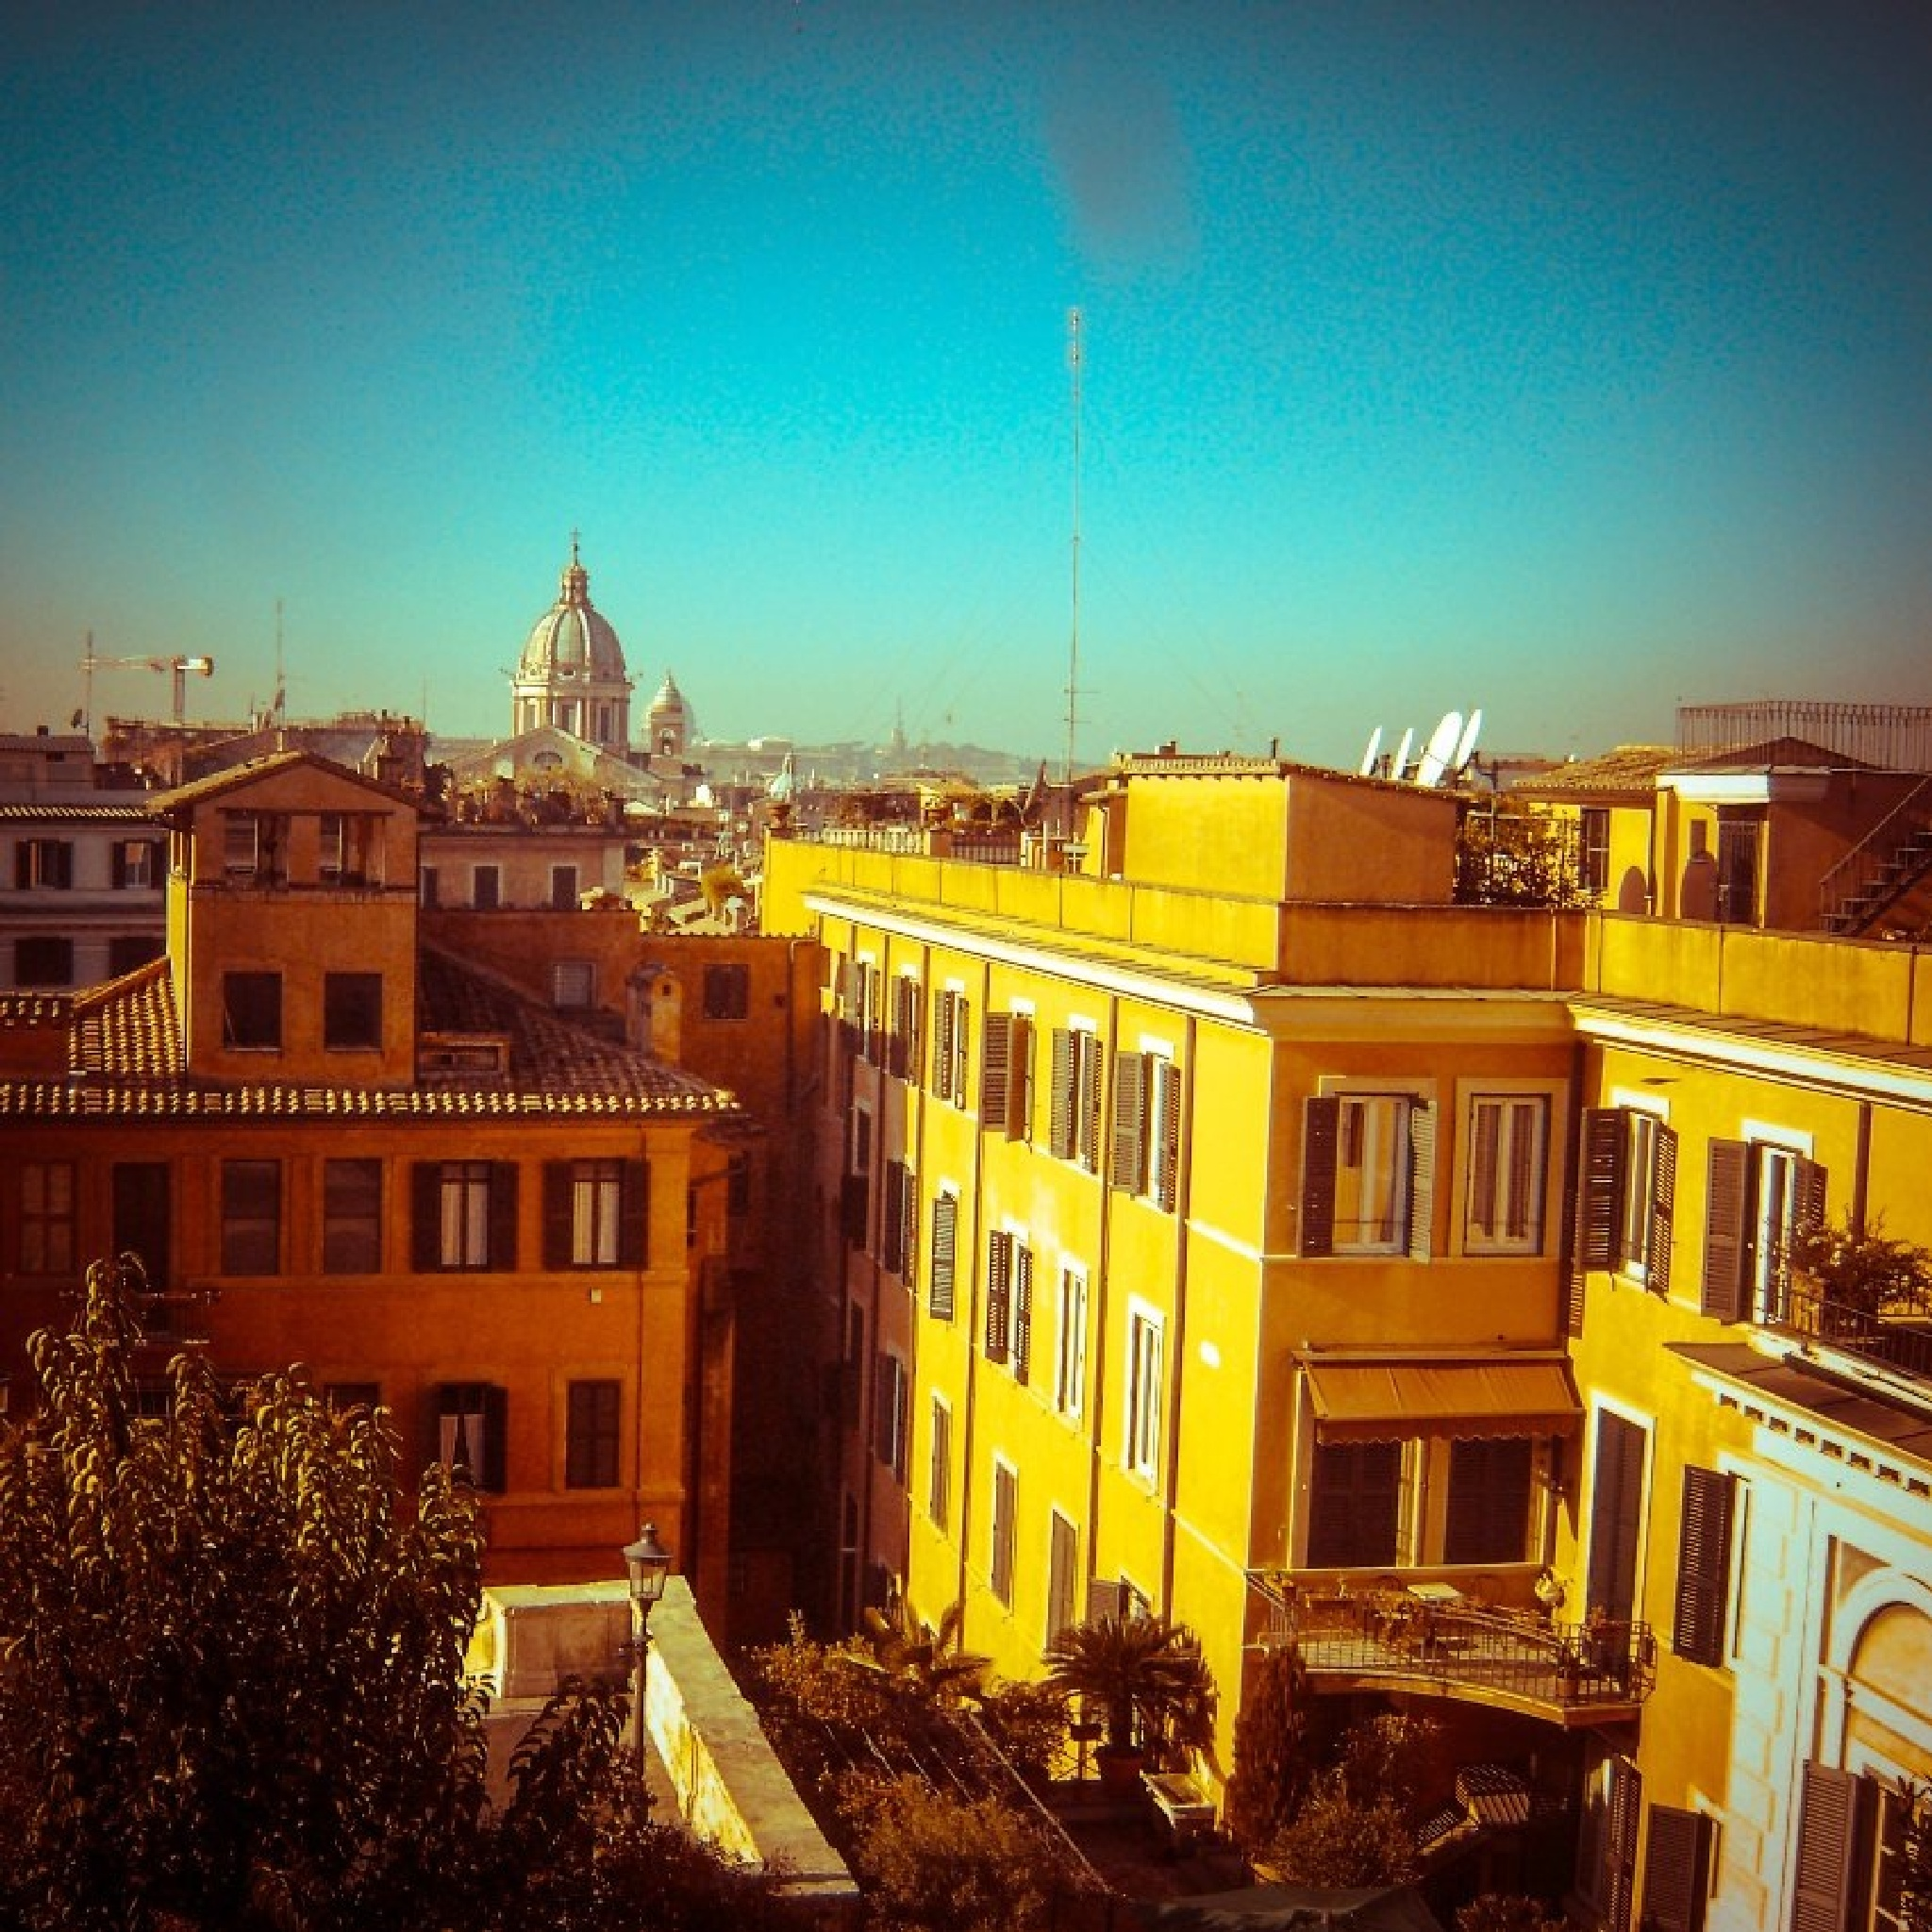 Italia - Rome - 3 by Emre YALÇIN